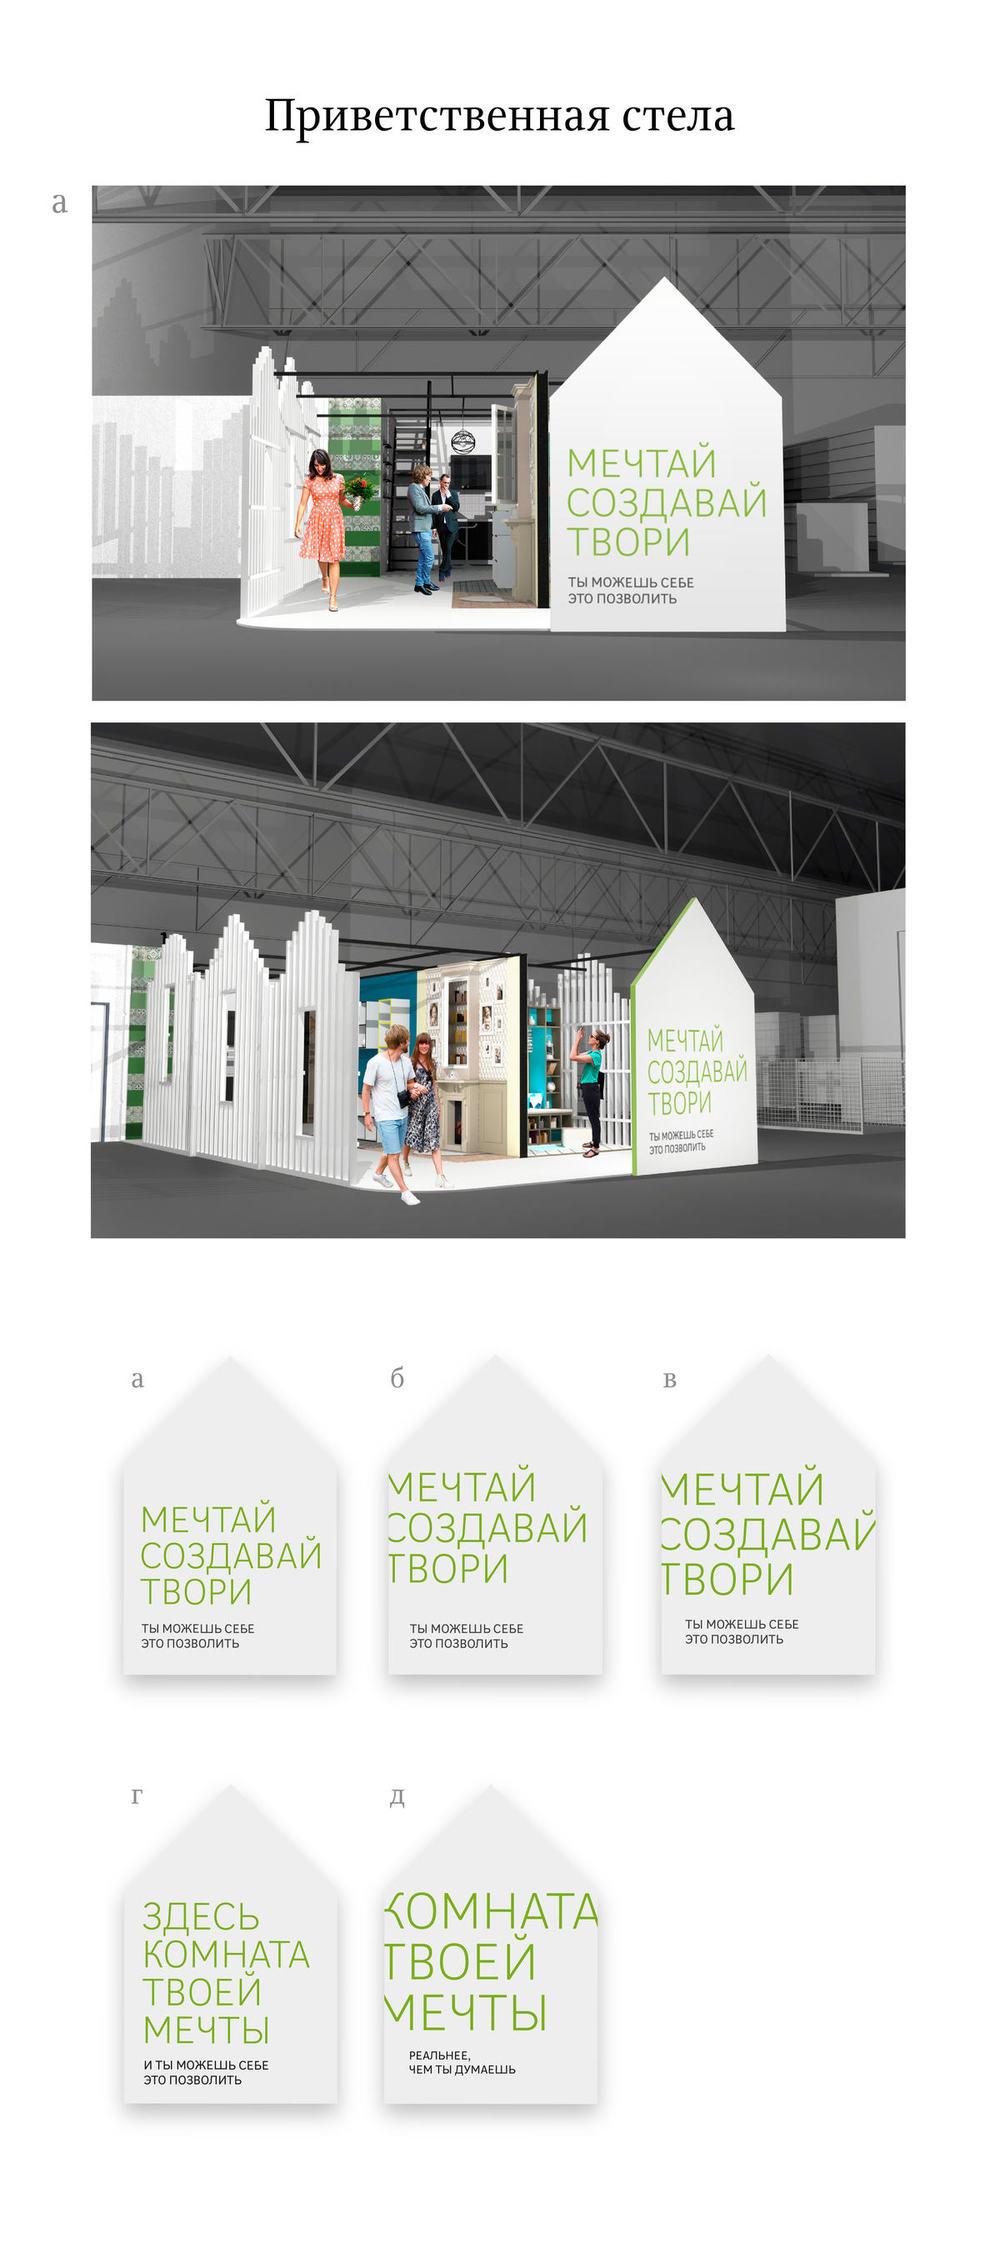 the making of the leroy merlin kaliningrad stores interior design. Black Bedroom Furniture Sets. Home Design Ideas